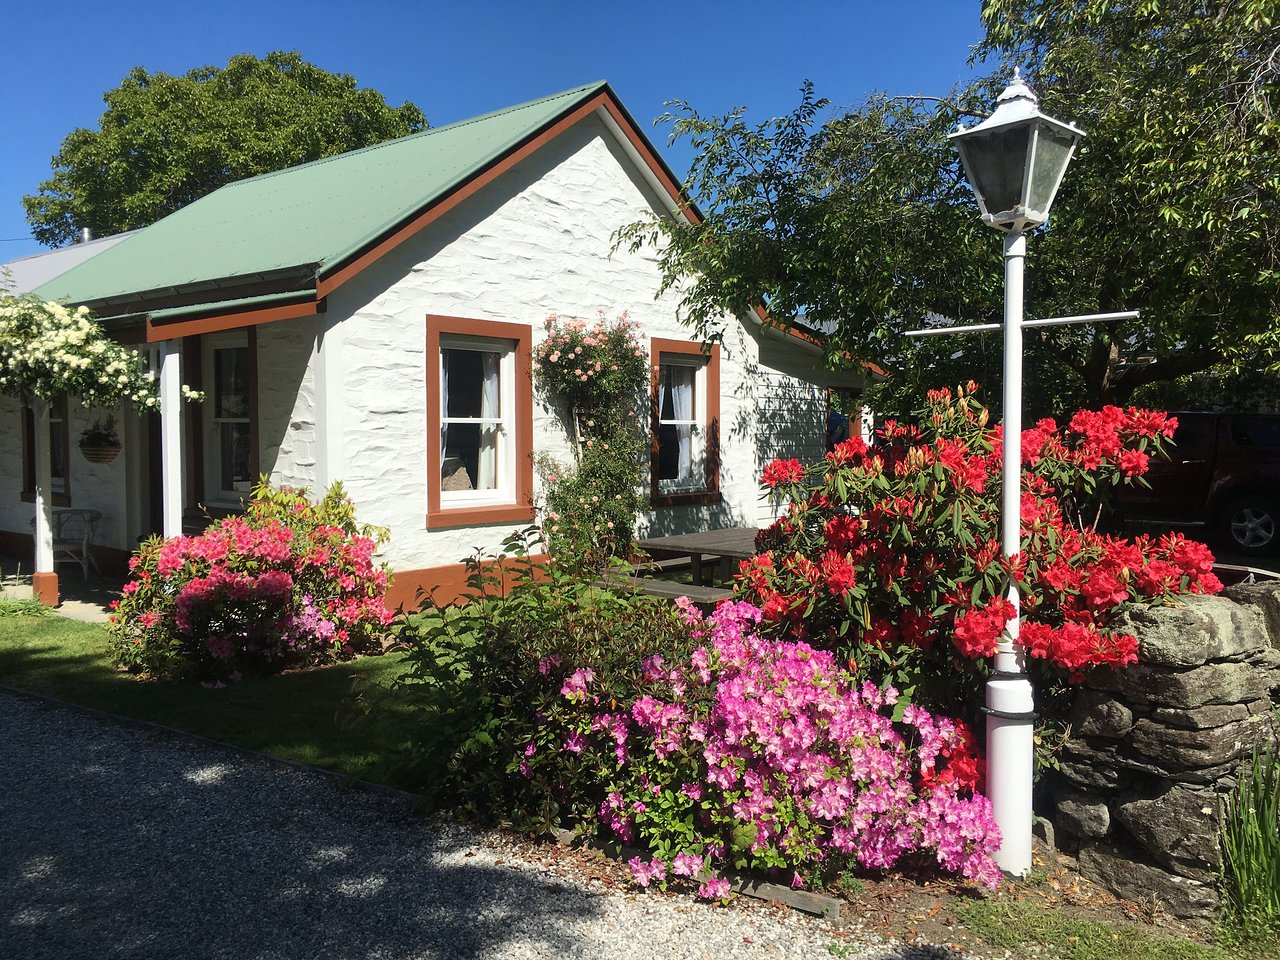 settlers cottage motel 73 9 1 updated 2019 prices hotel rh tripadvisor com